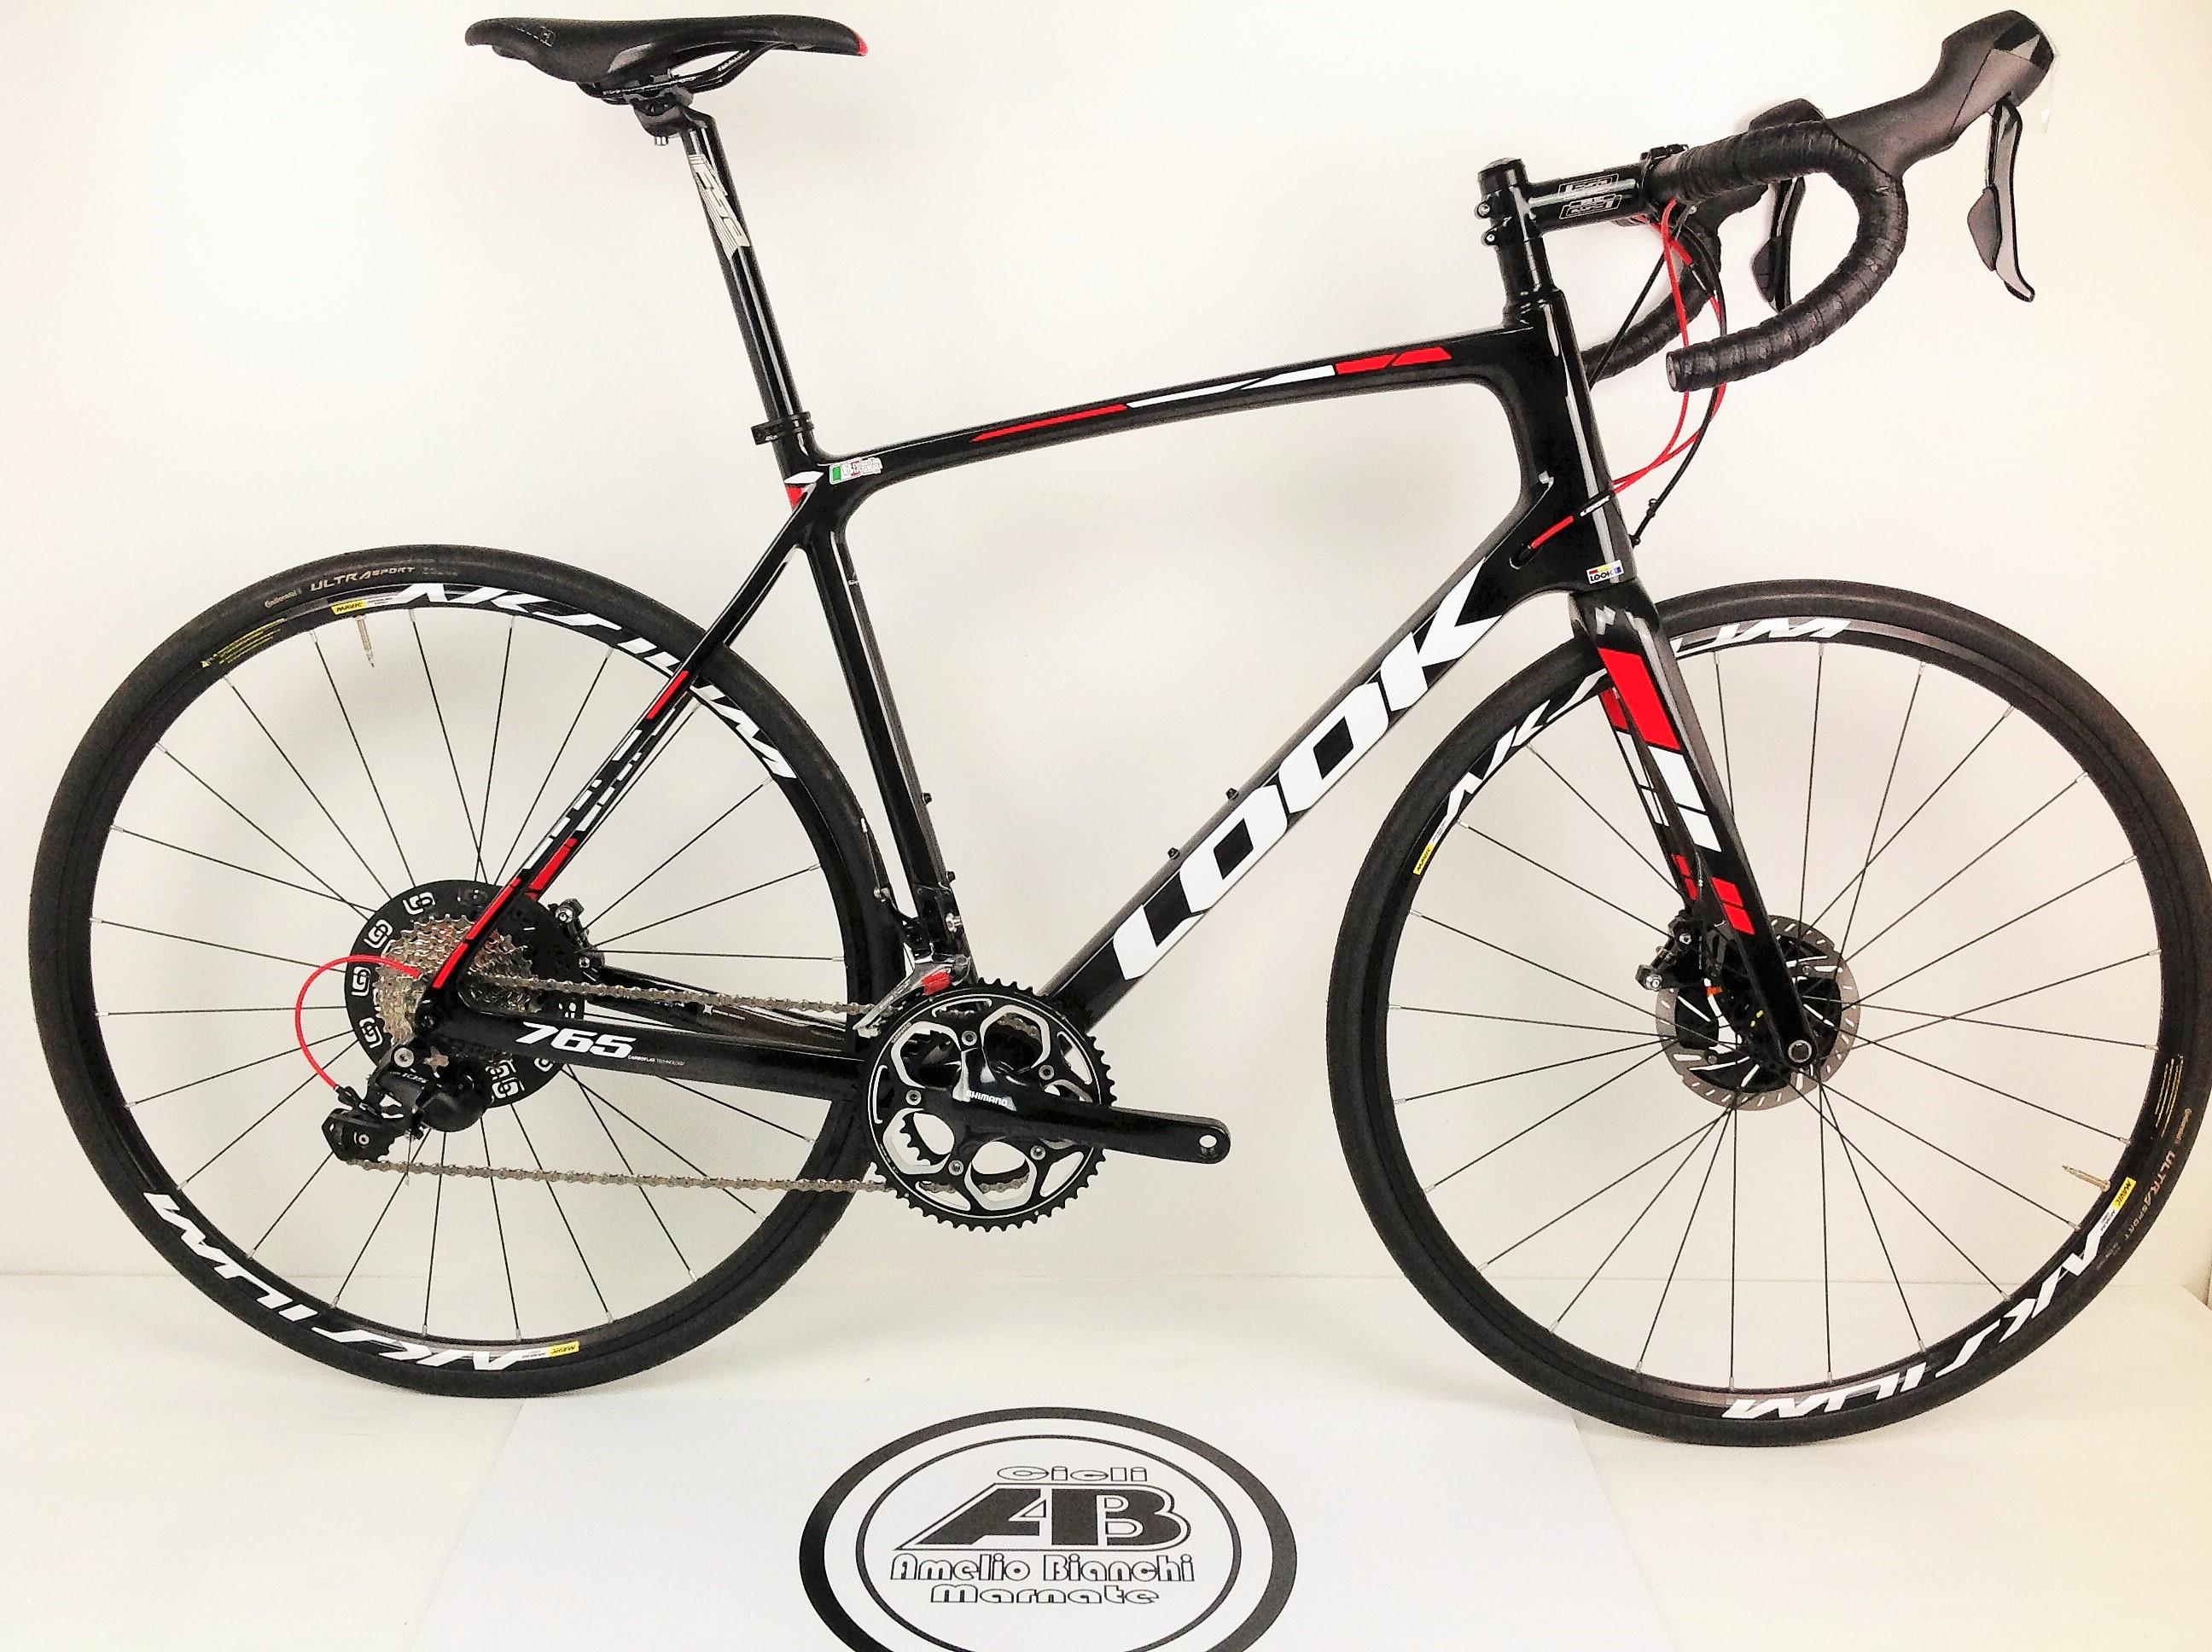 Bici completa LOOK 765 Disc Shimano 105 taglia L